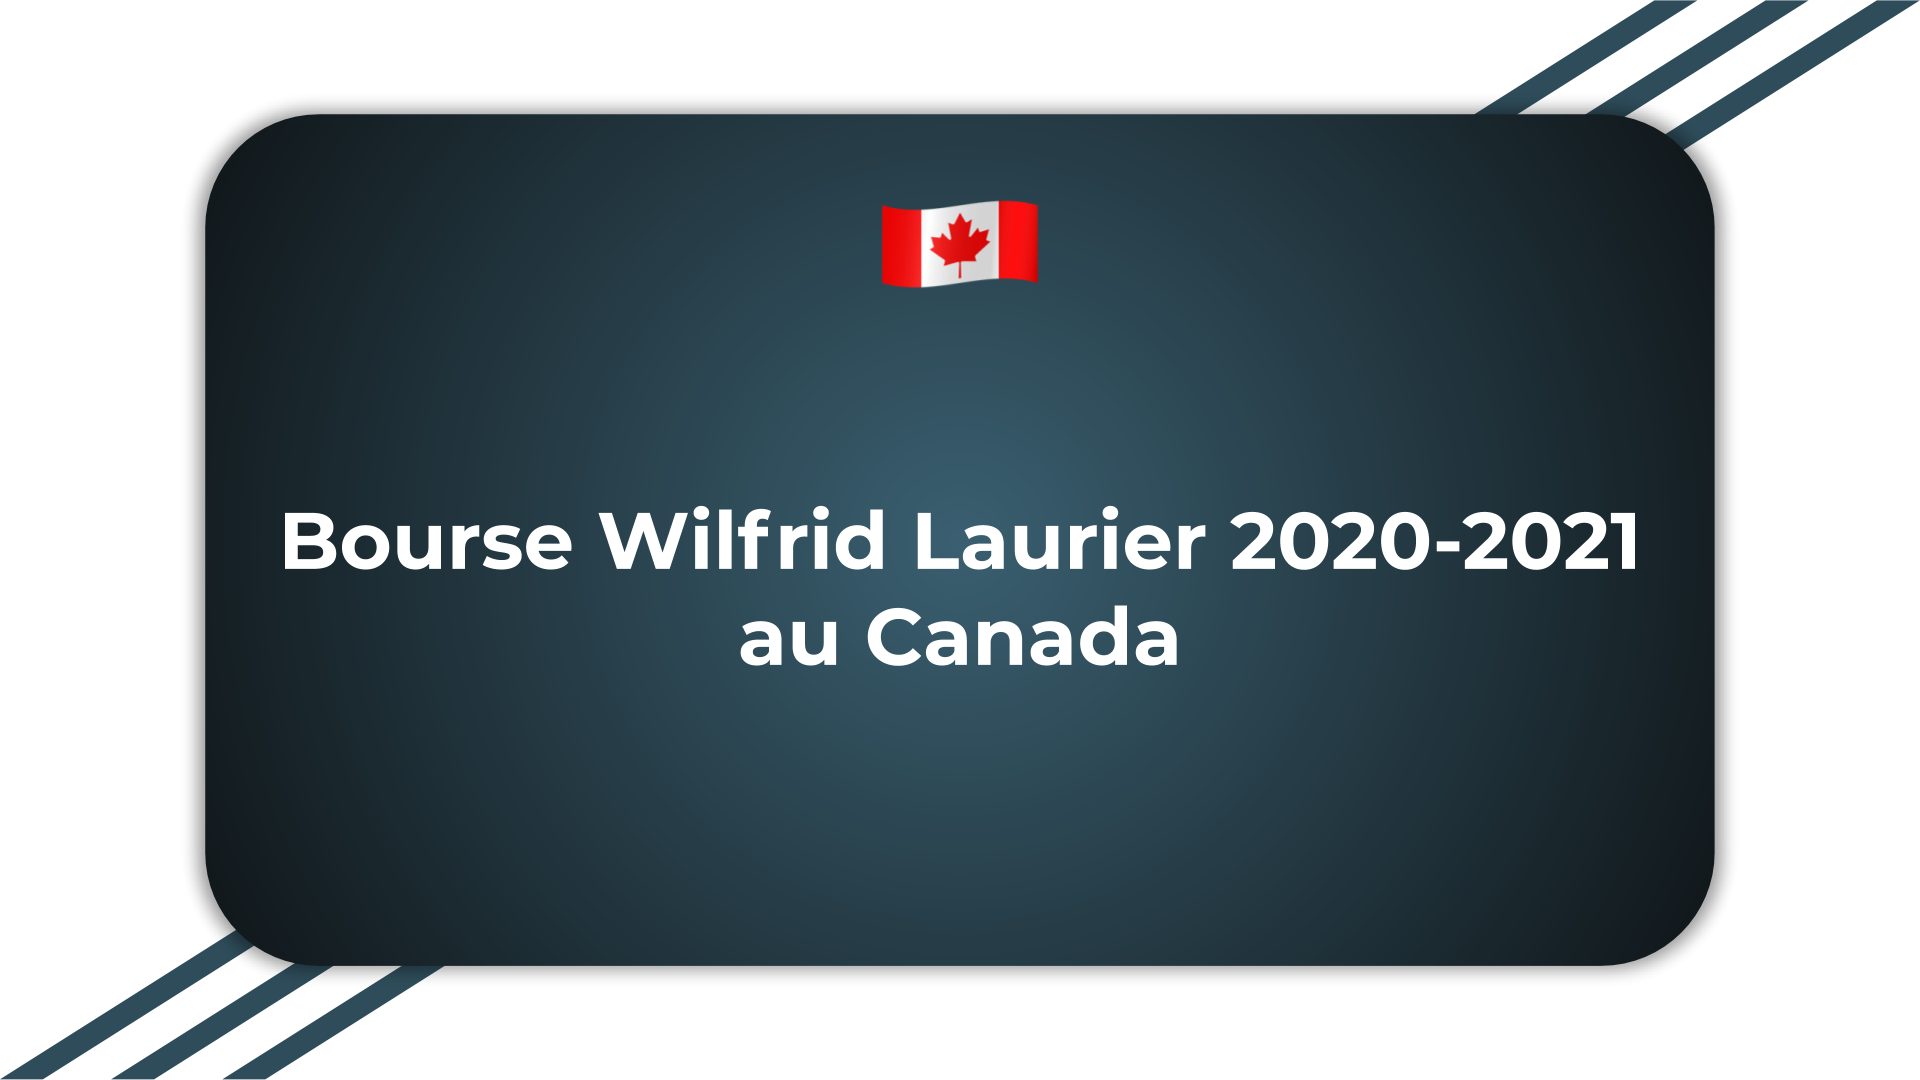 Bourse Wilfrid Laurier